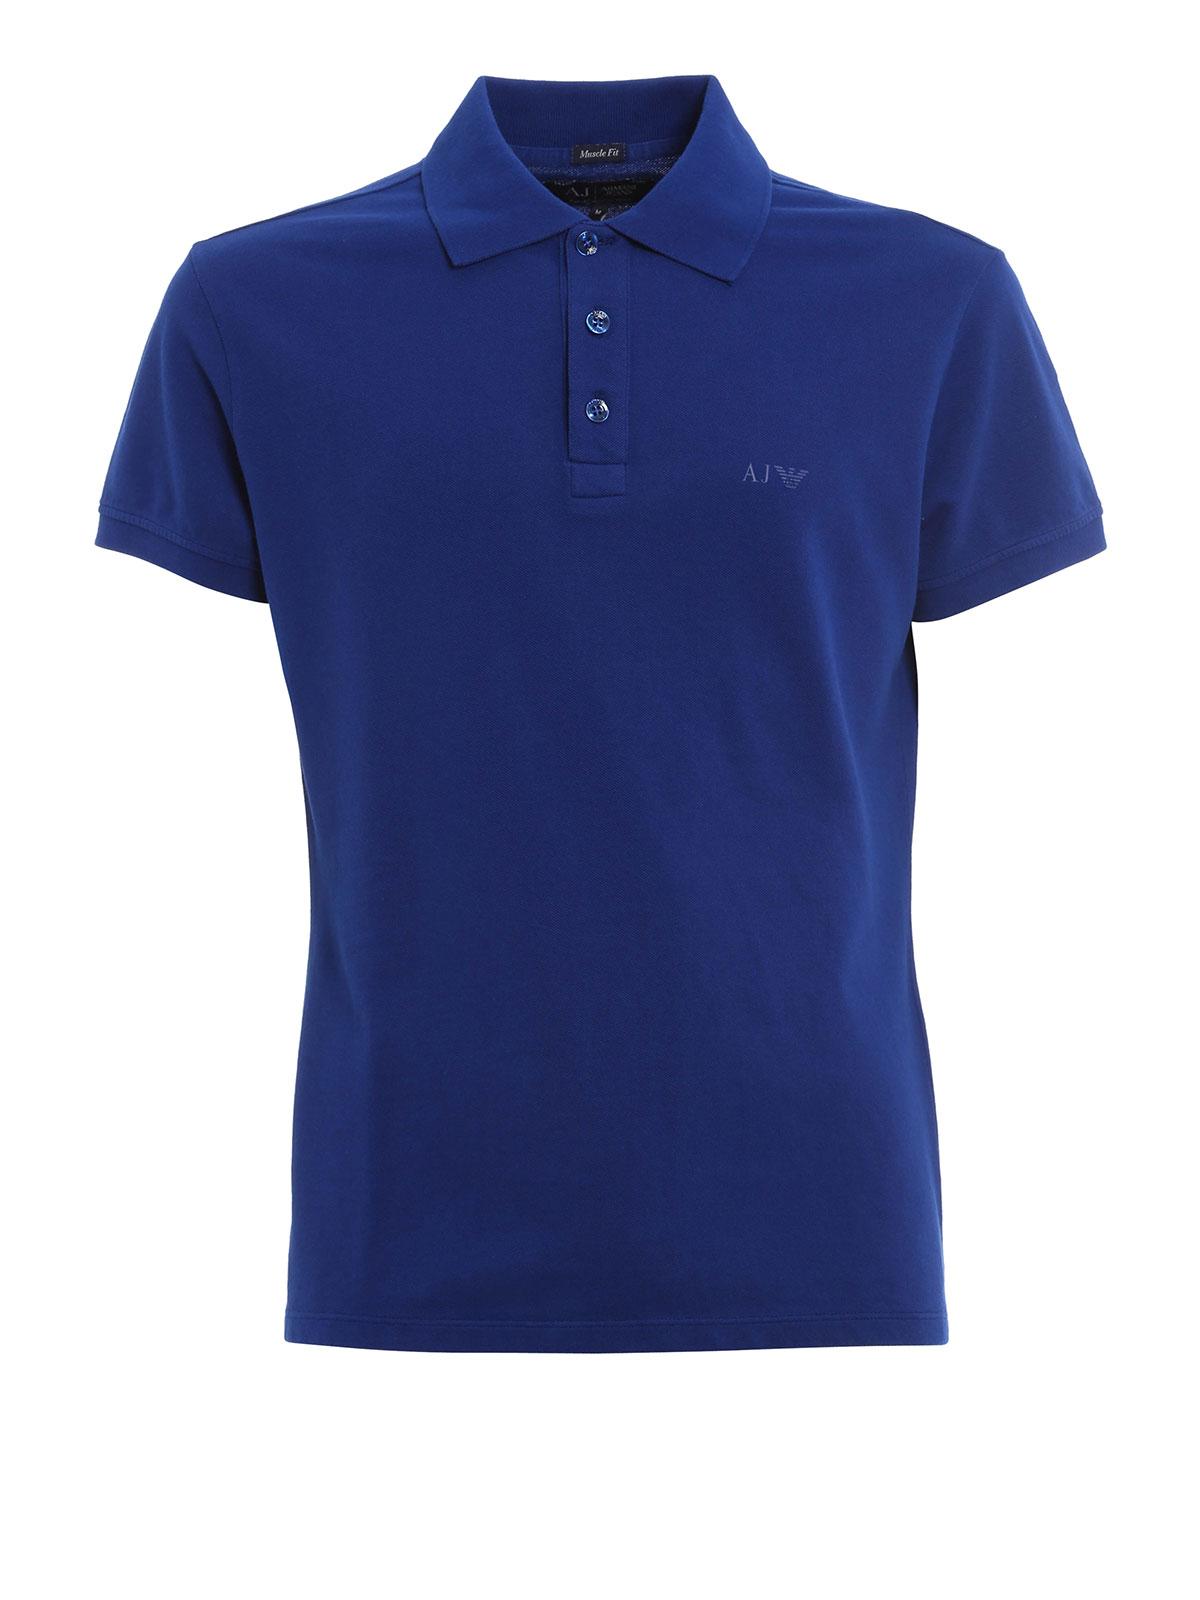 aj polo shirt